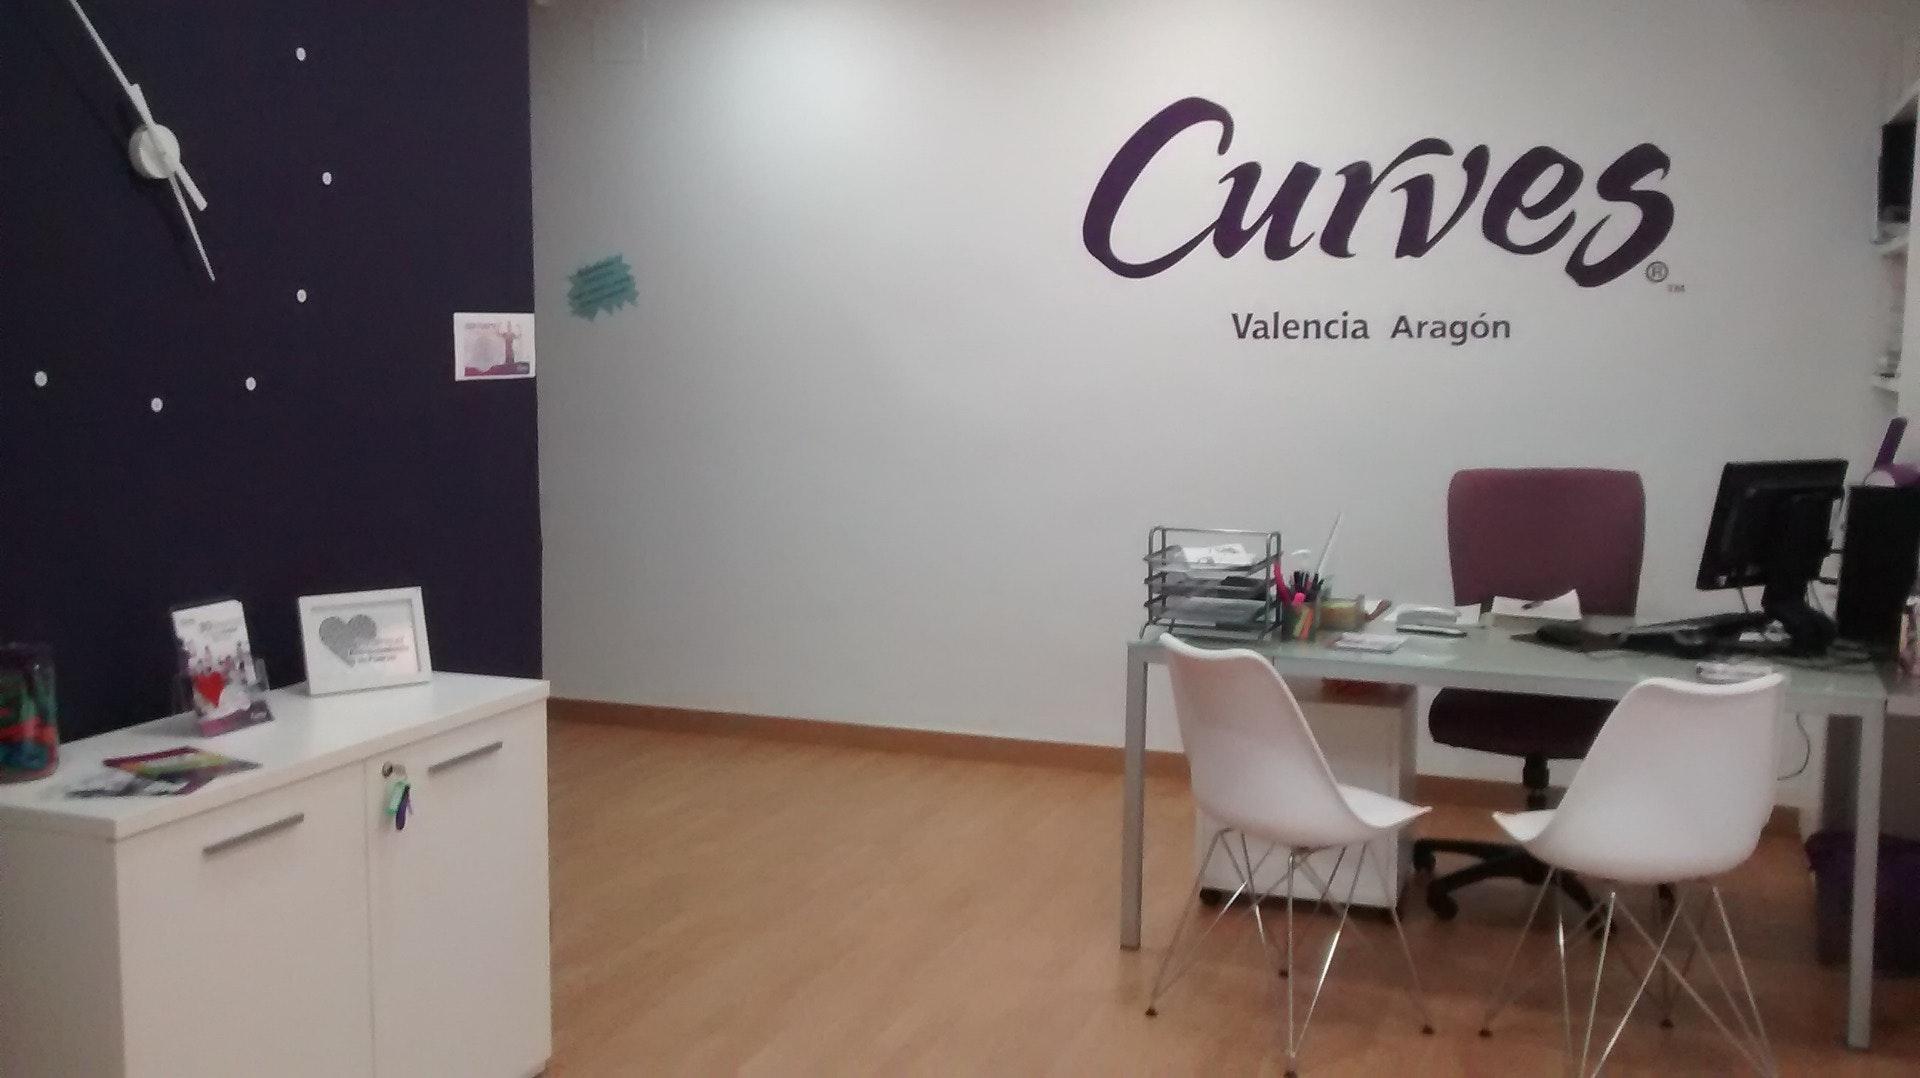 Foto 4 Oferta Curves Valencia Aragón Valencia {2} - GymForLess